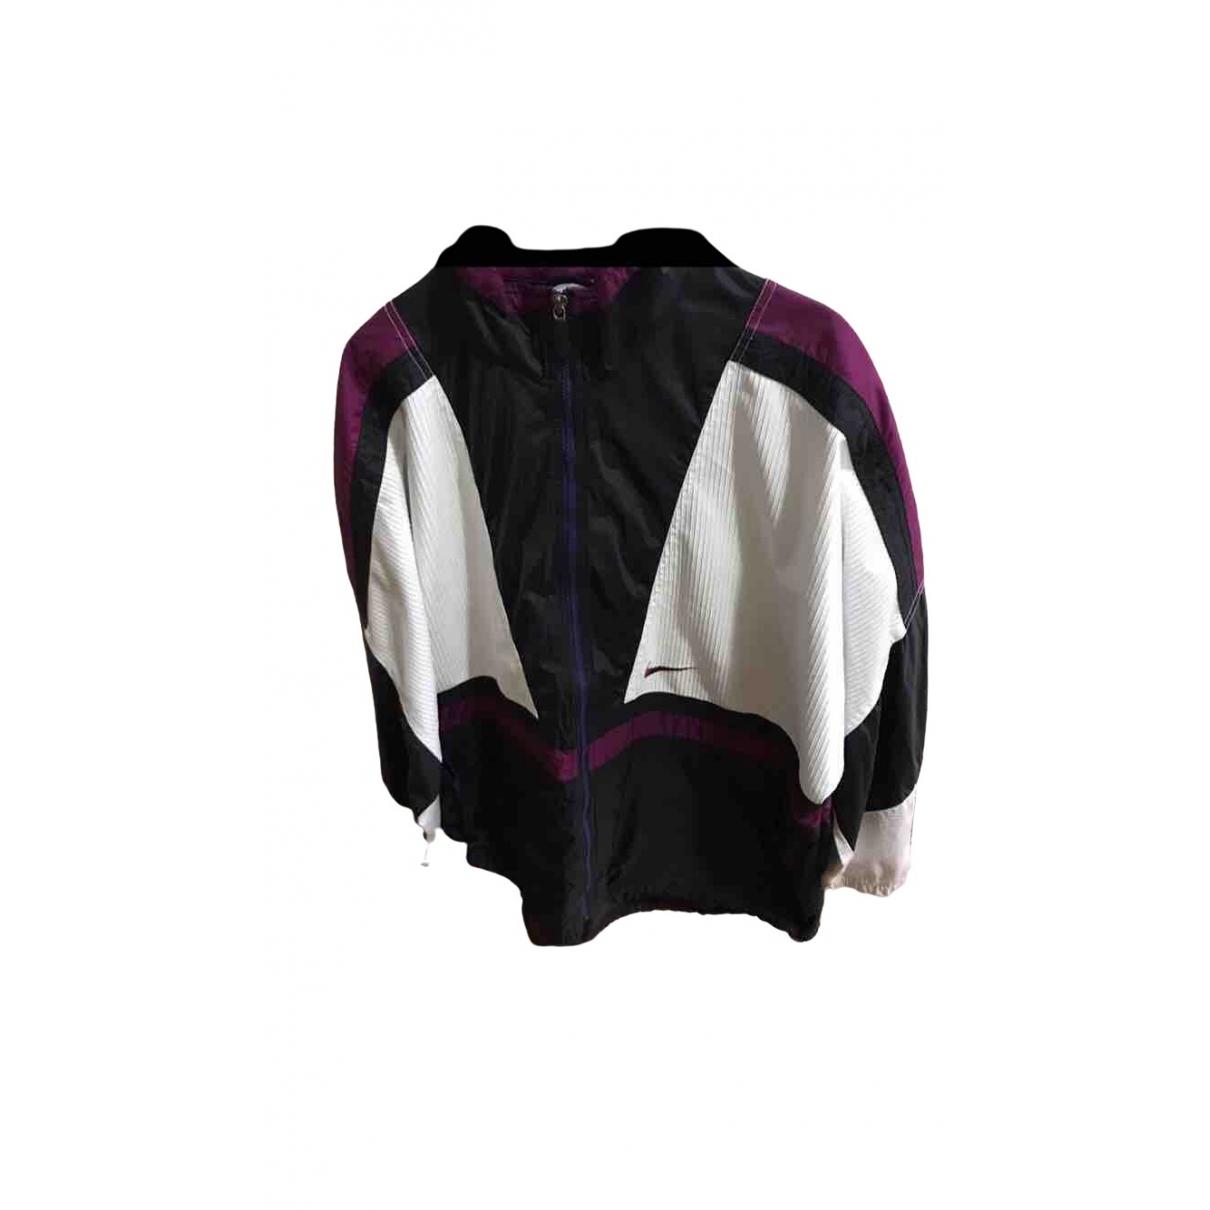 Nike \N Black jacket  for Men XL International